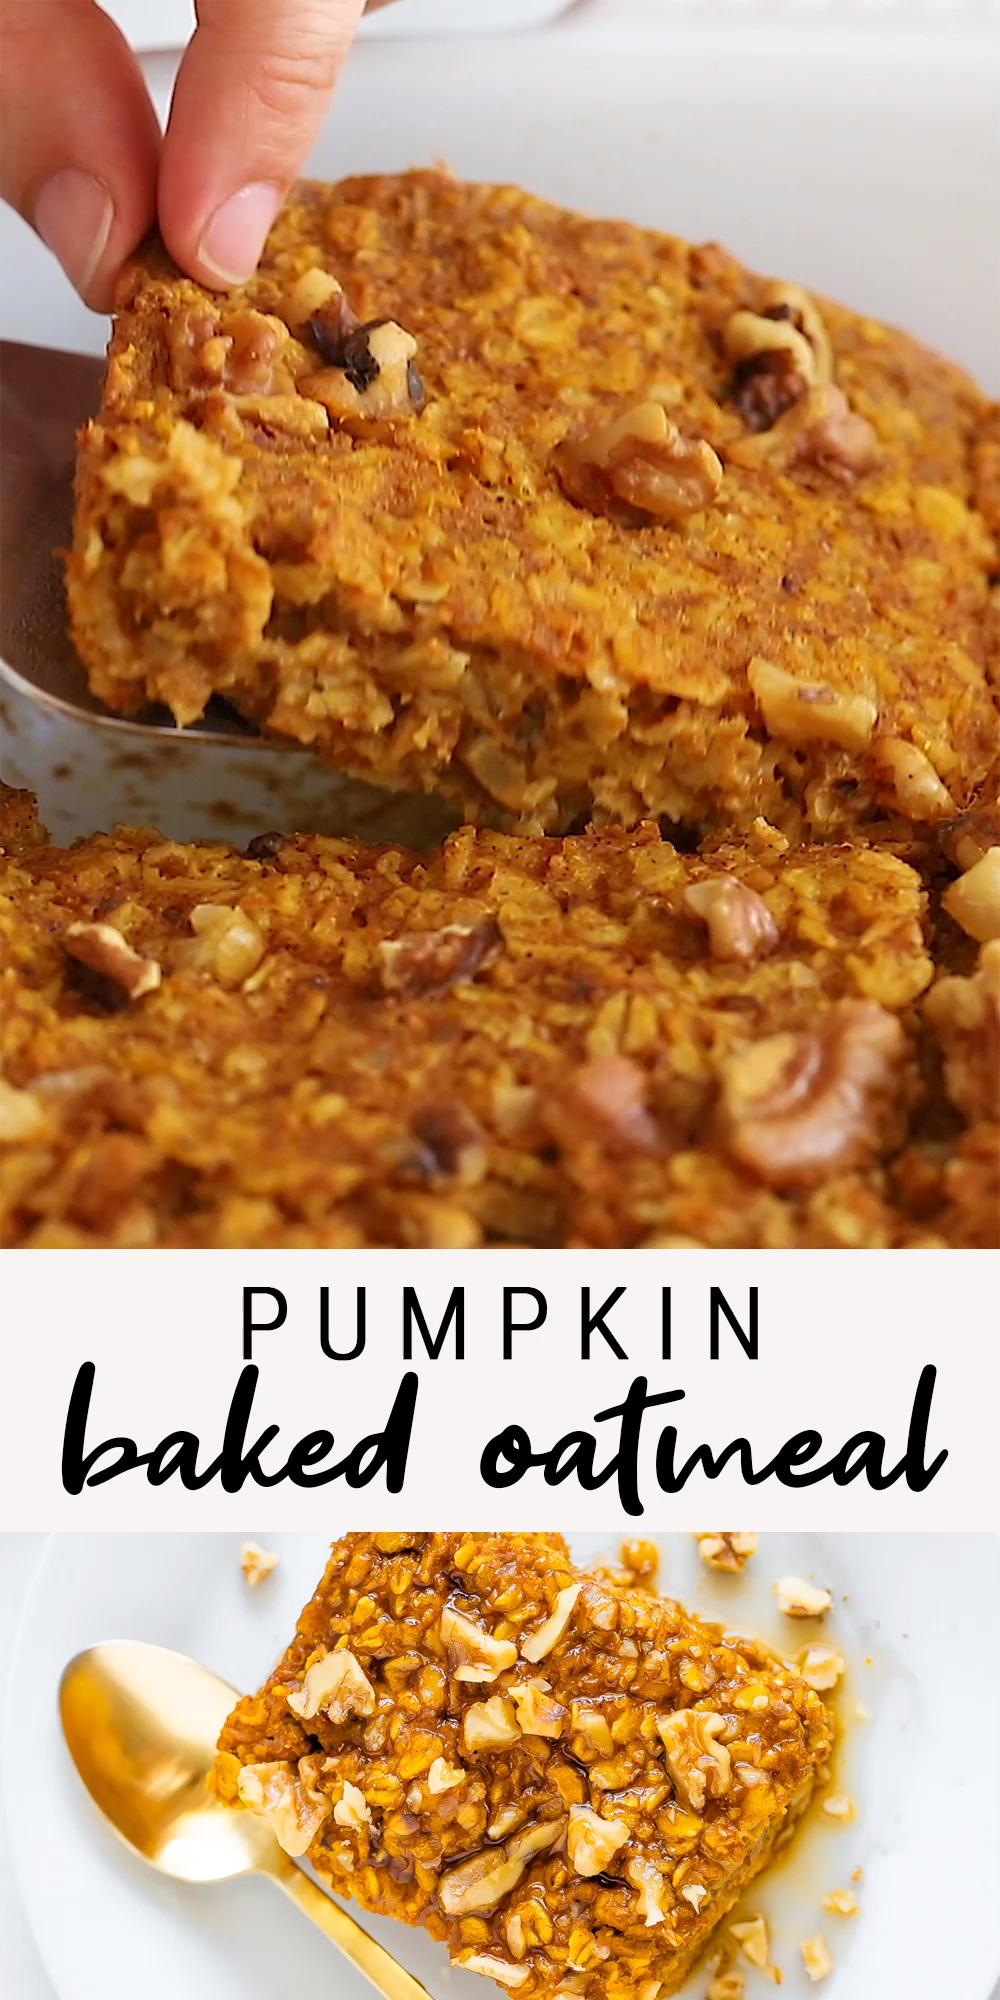 Easy Pumpkin Baked Oatmeal (Vegan + GF)   Eating Bird Food